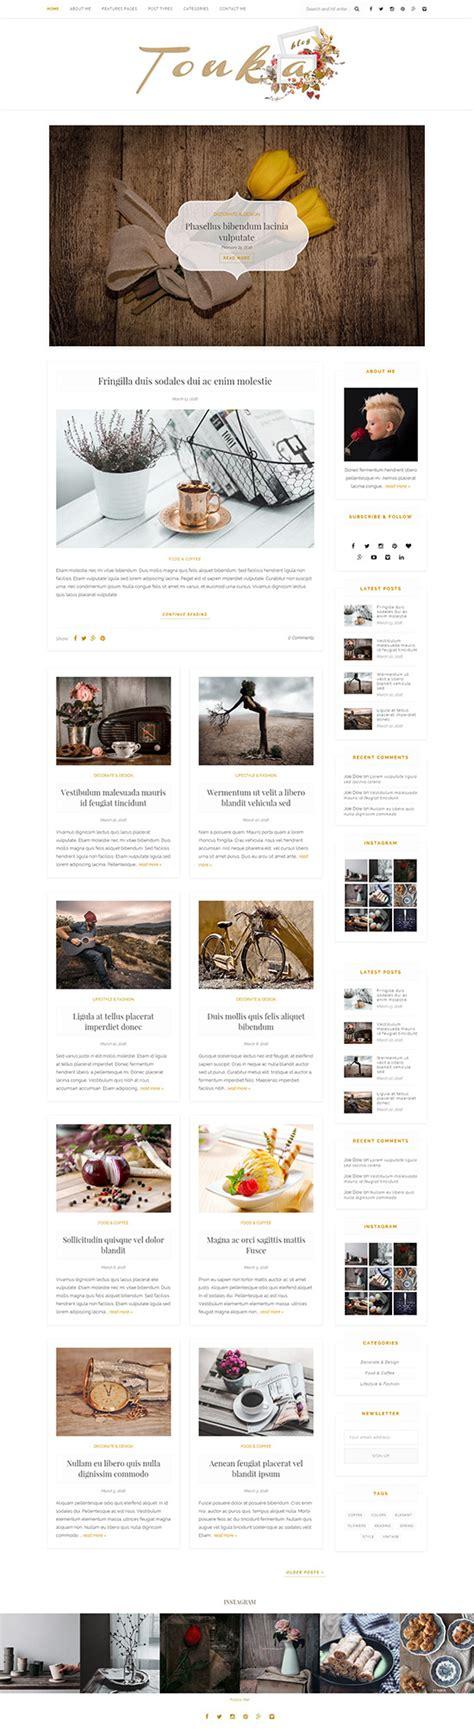 wordpress blog themes elegant tonka an elegant wordpress blog theme themes templates